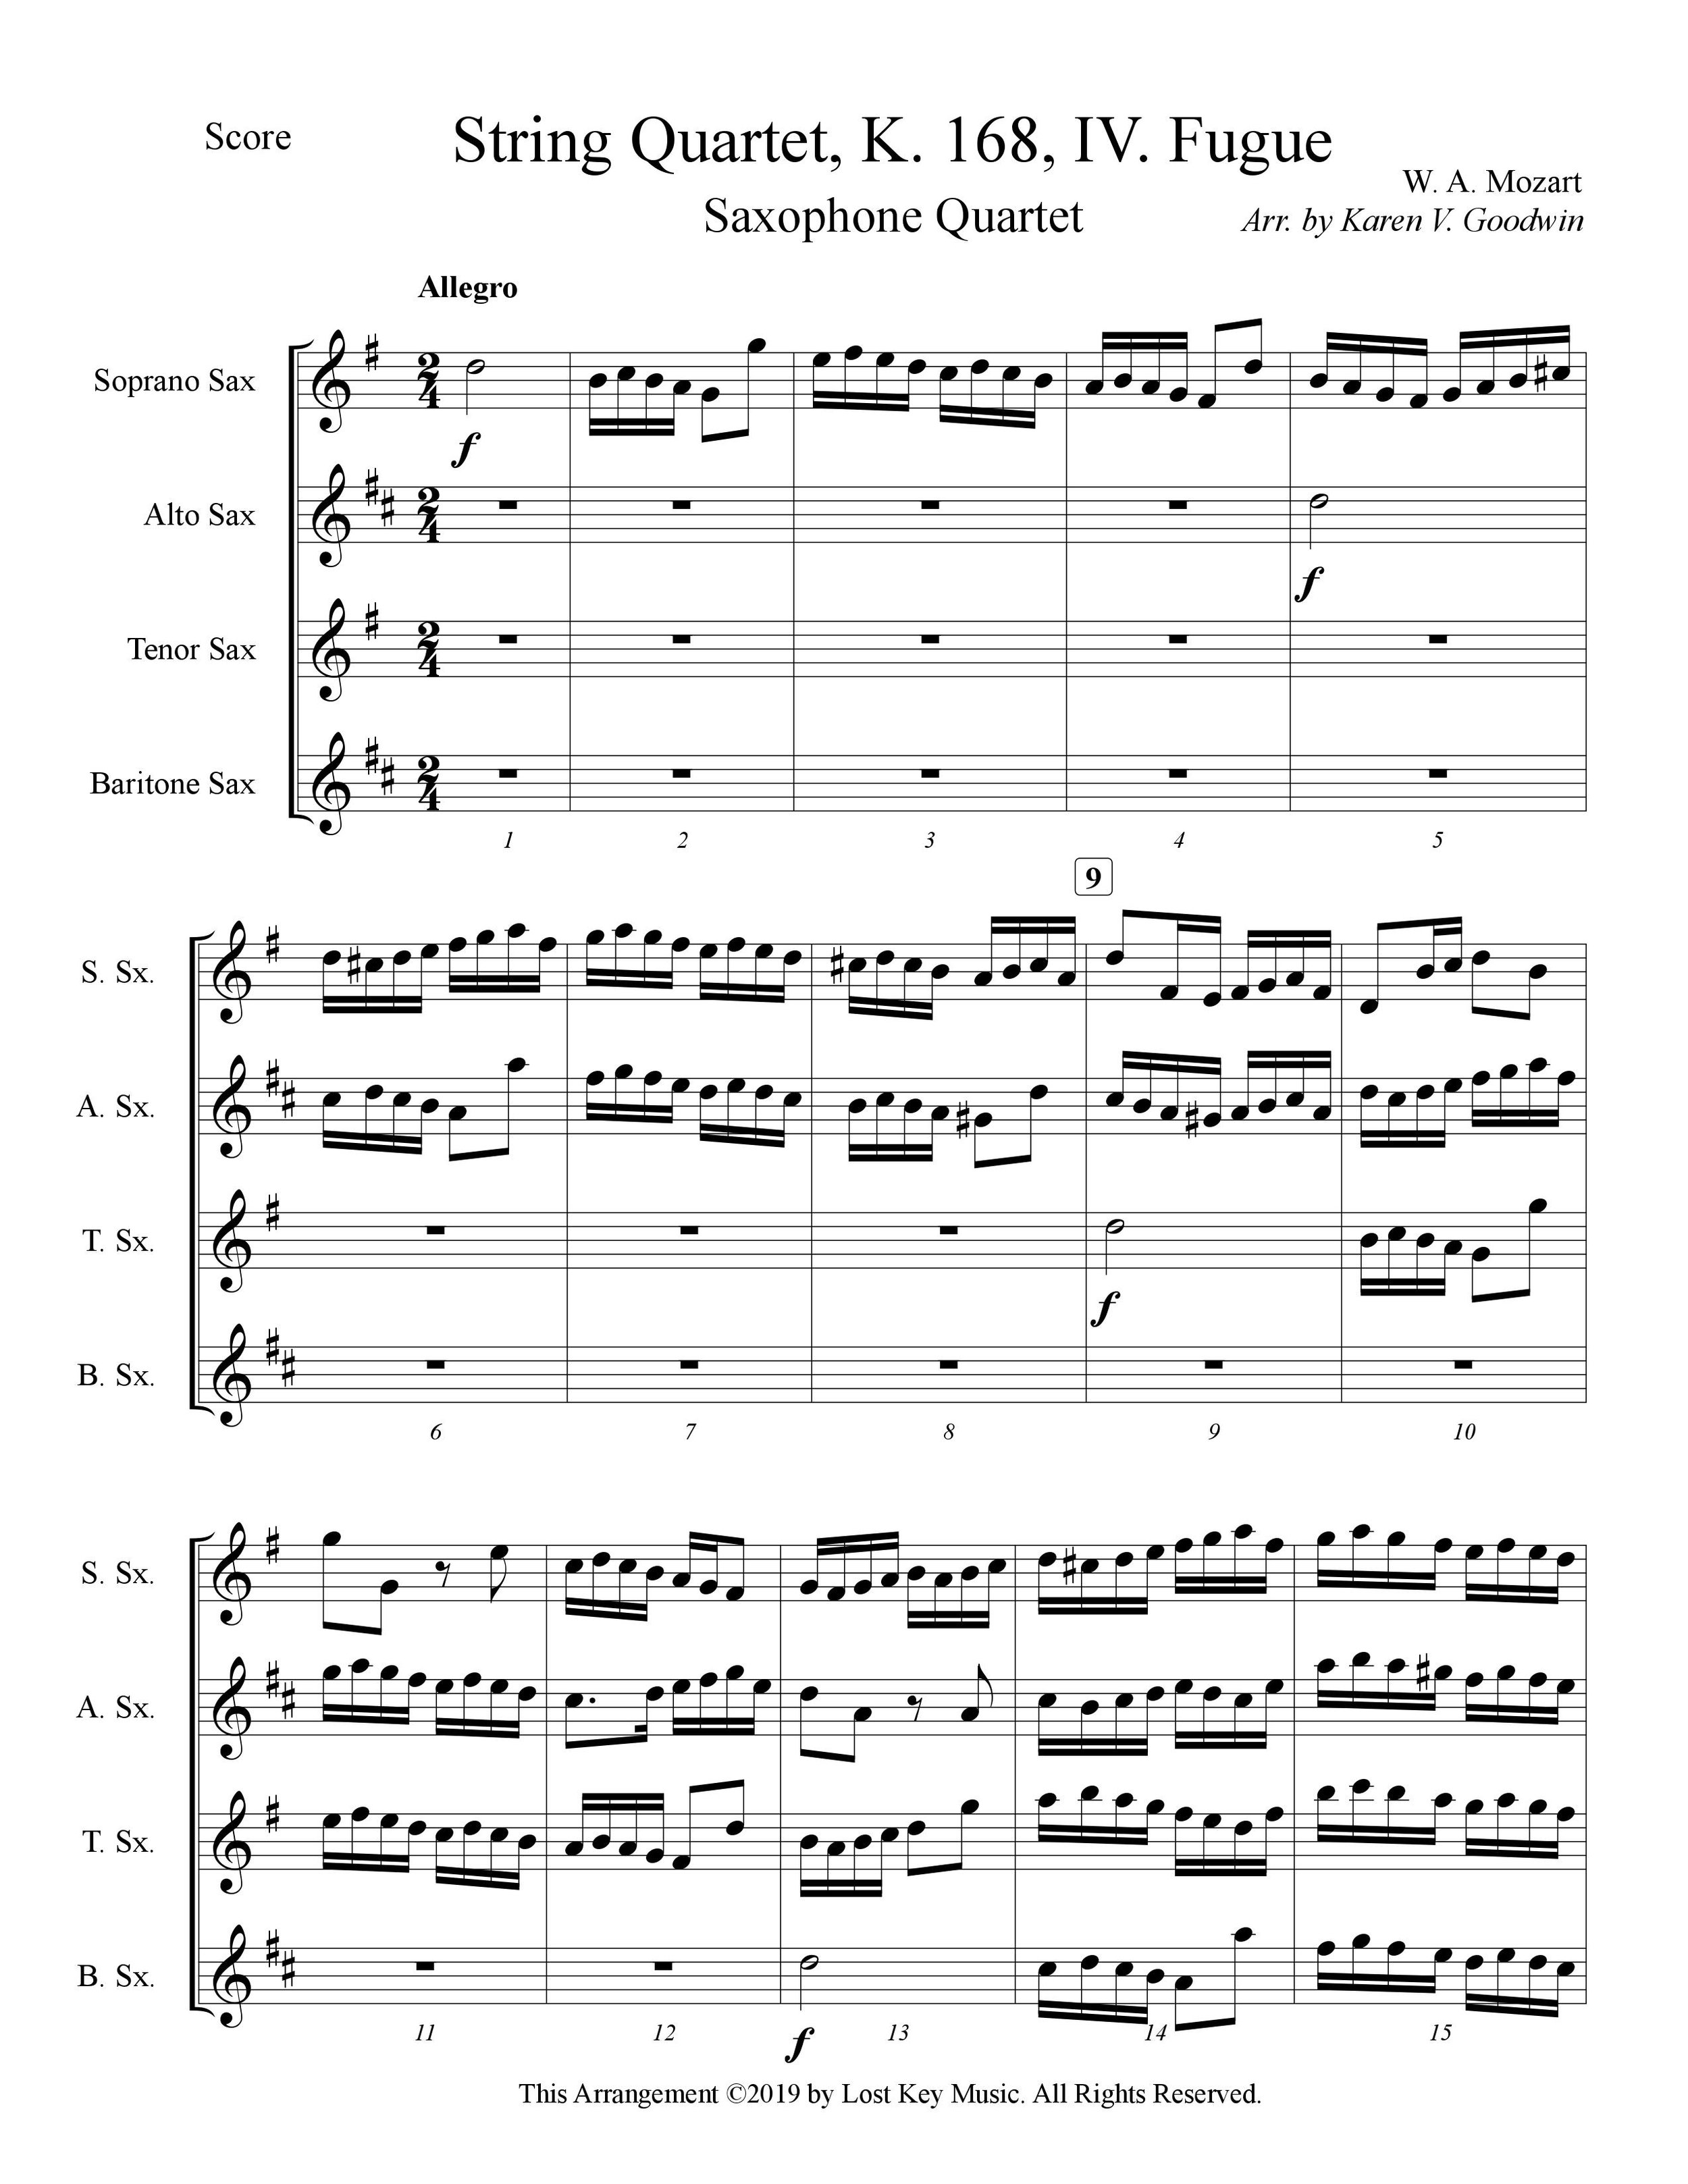 Mozart String Quartet, K. 168, IV. Fugue-Saxophone Quartet-Score Sample.jpg